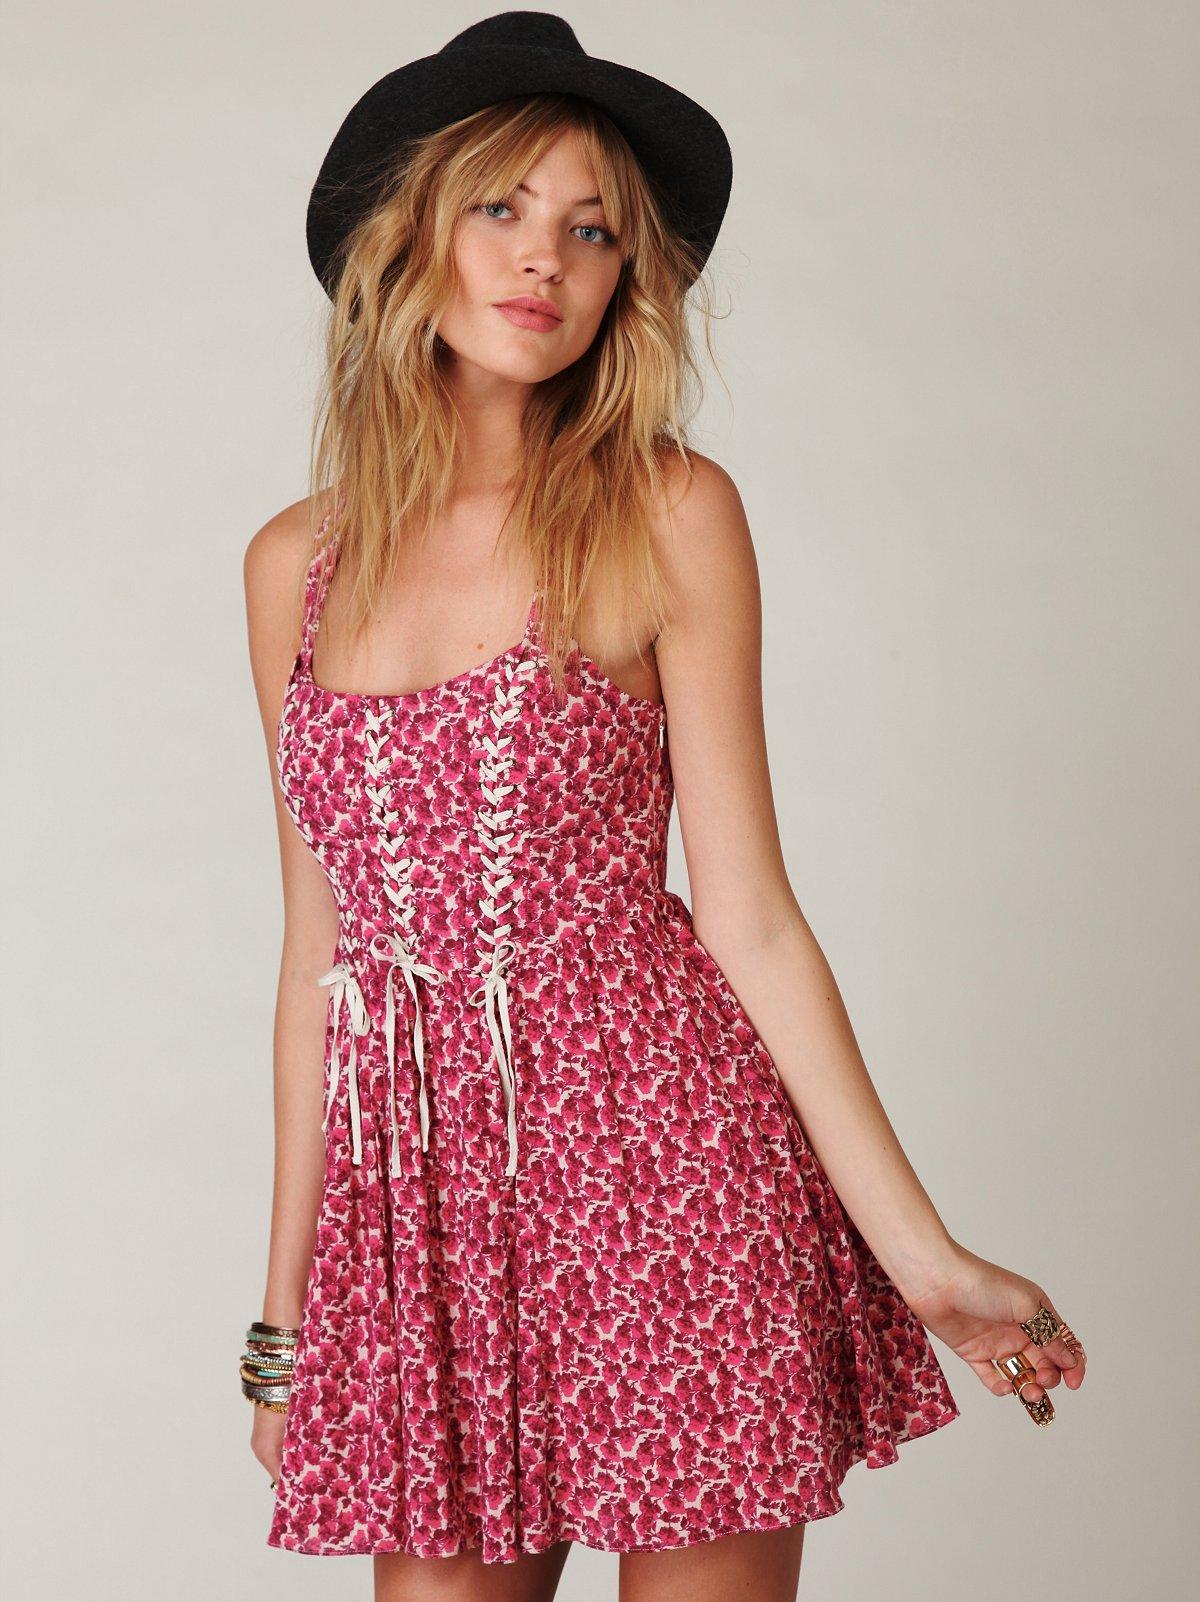 Desert Rose Corset Dress